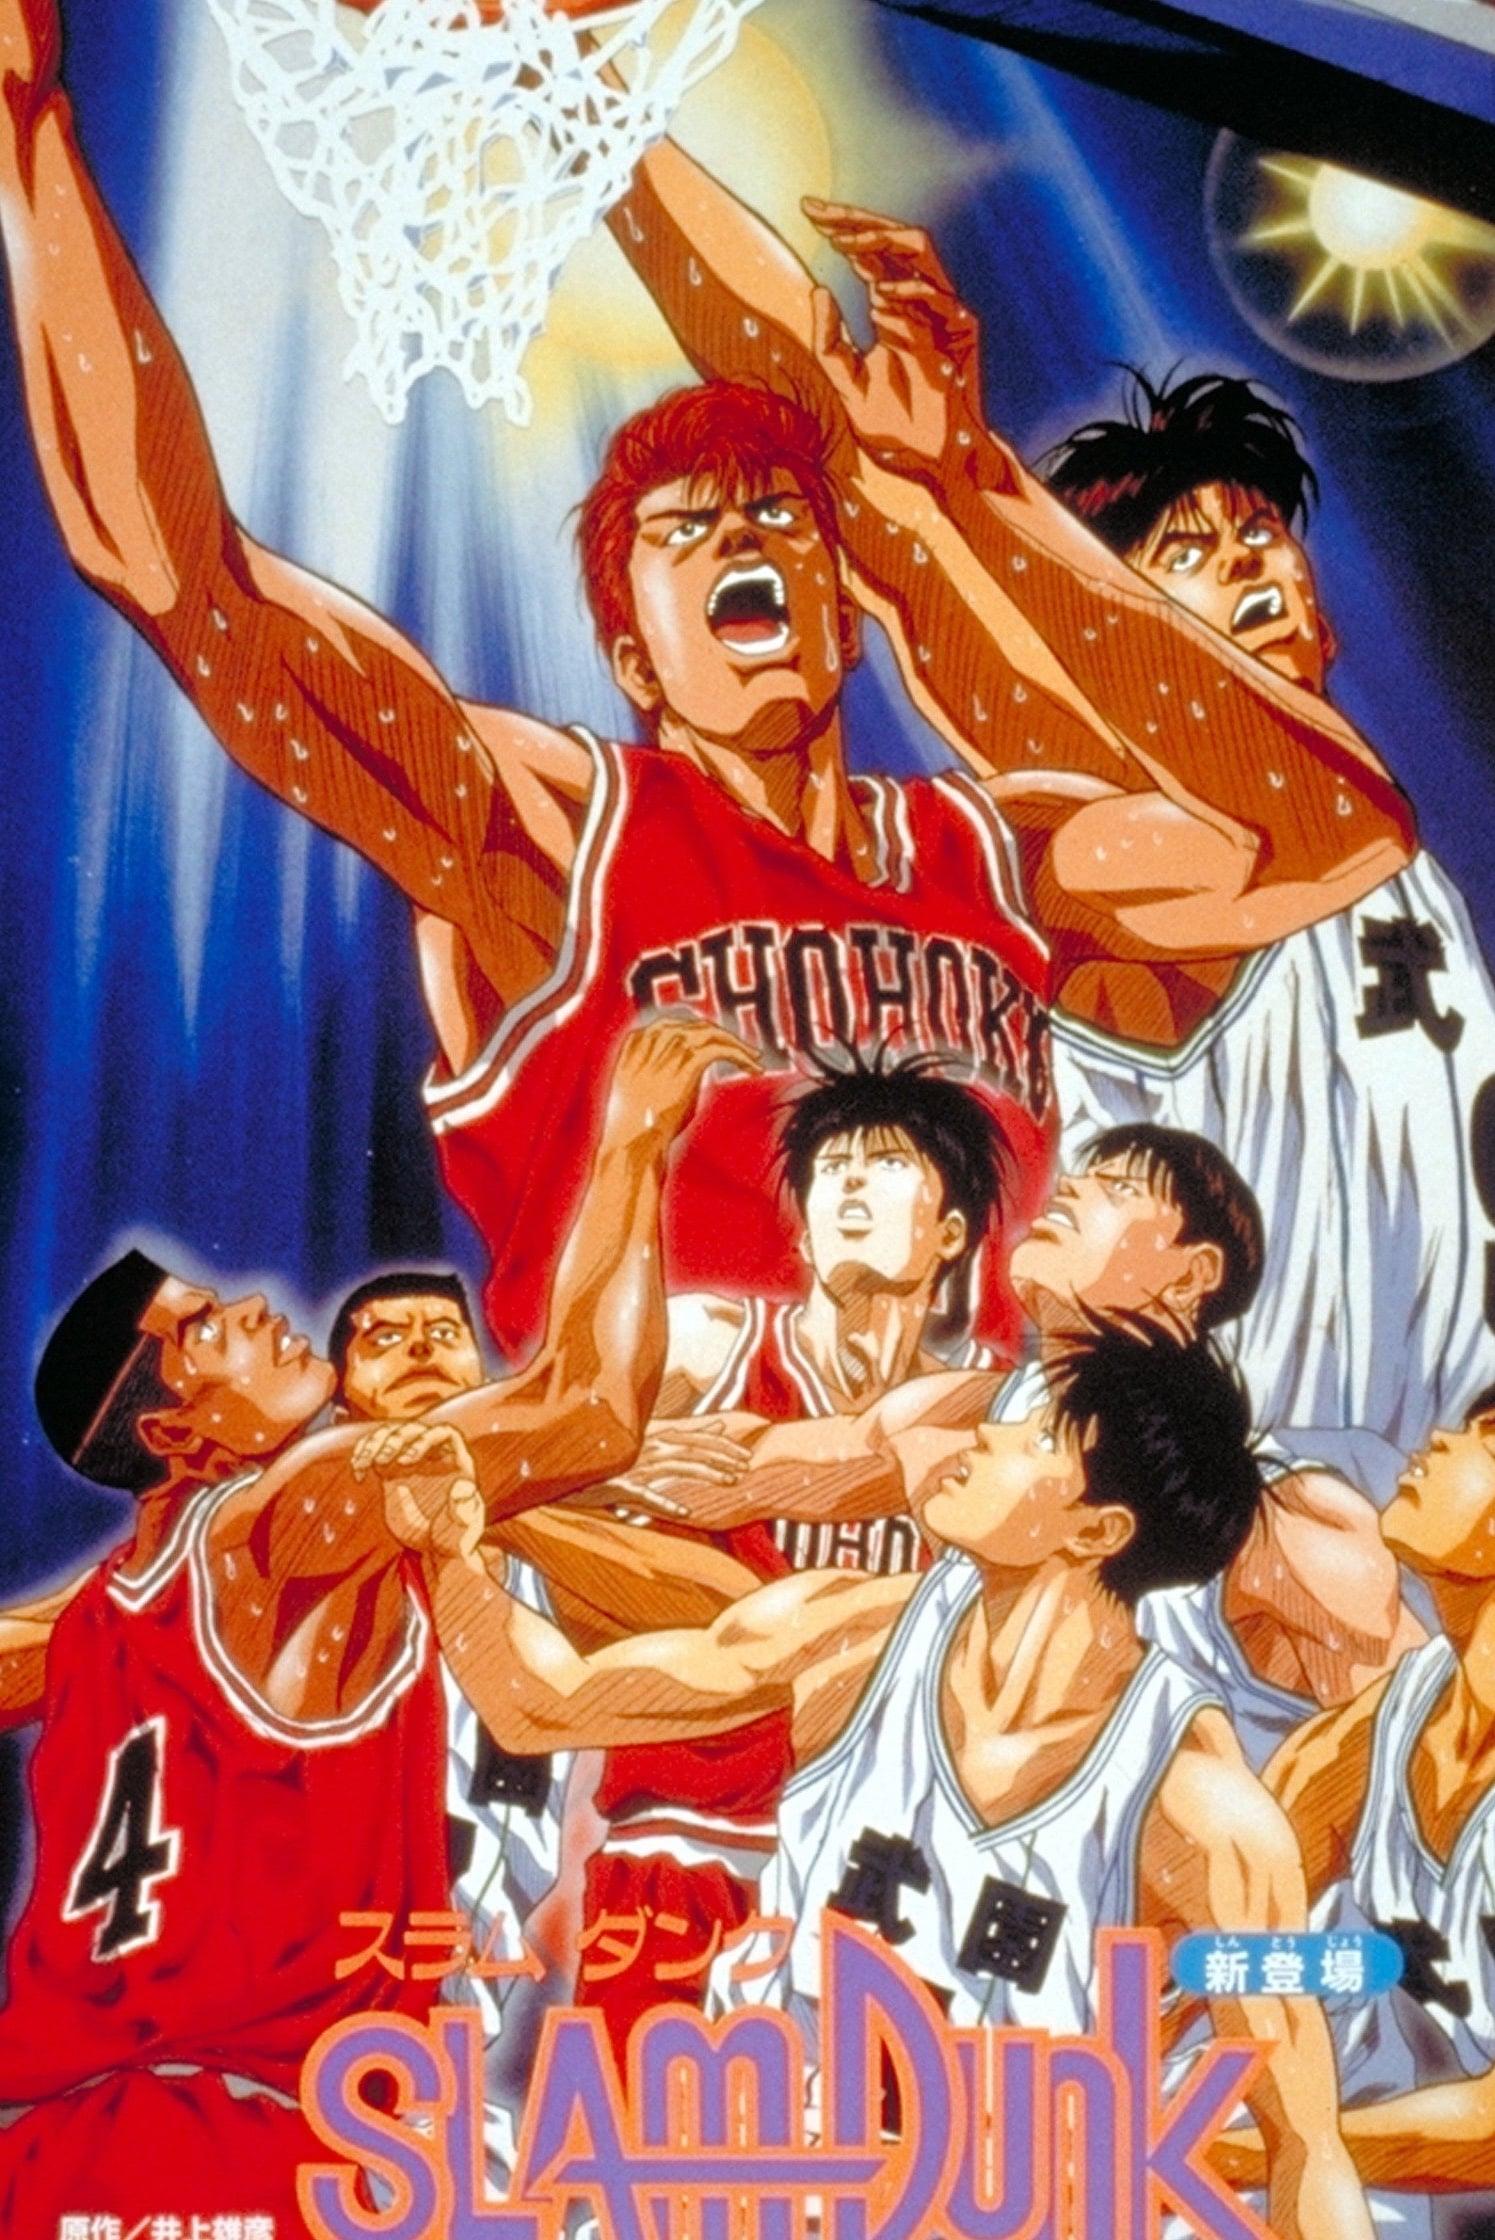 Slam Dunk: ¡El Campeonato Nacional! Ánimo Hanamichi Sakuragi